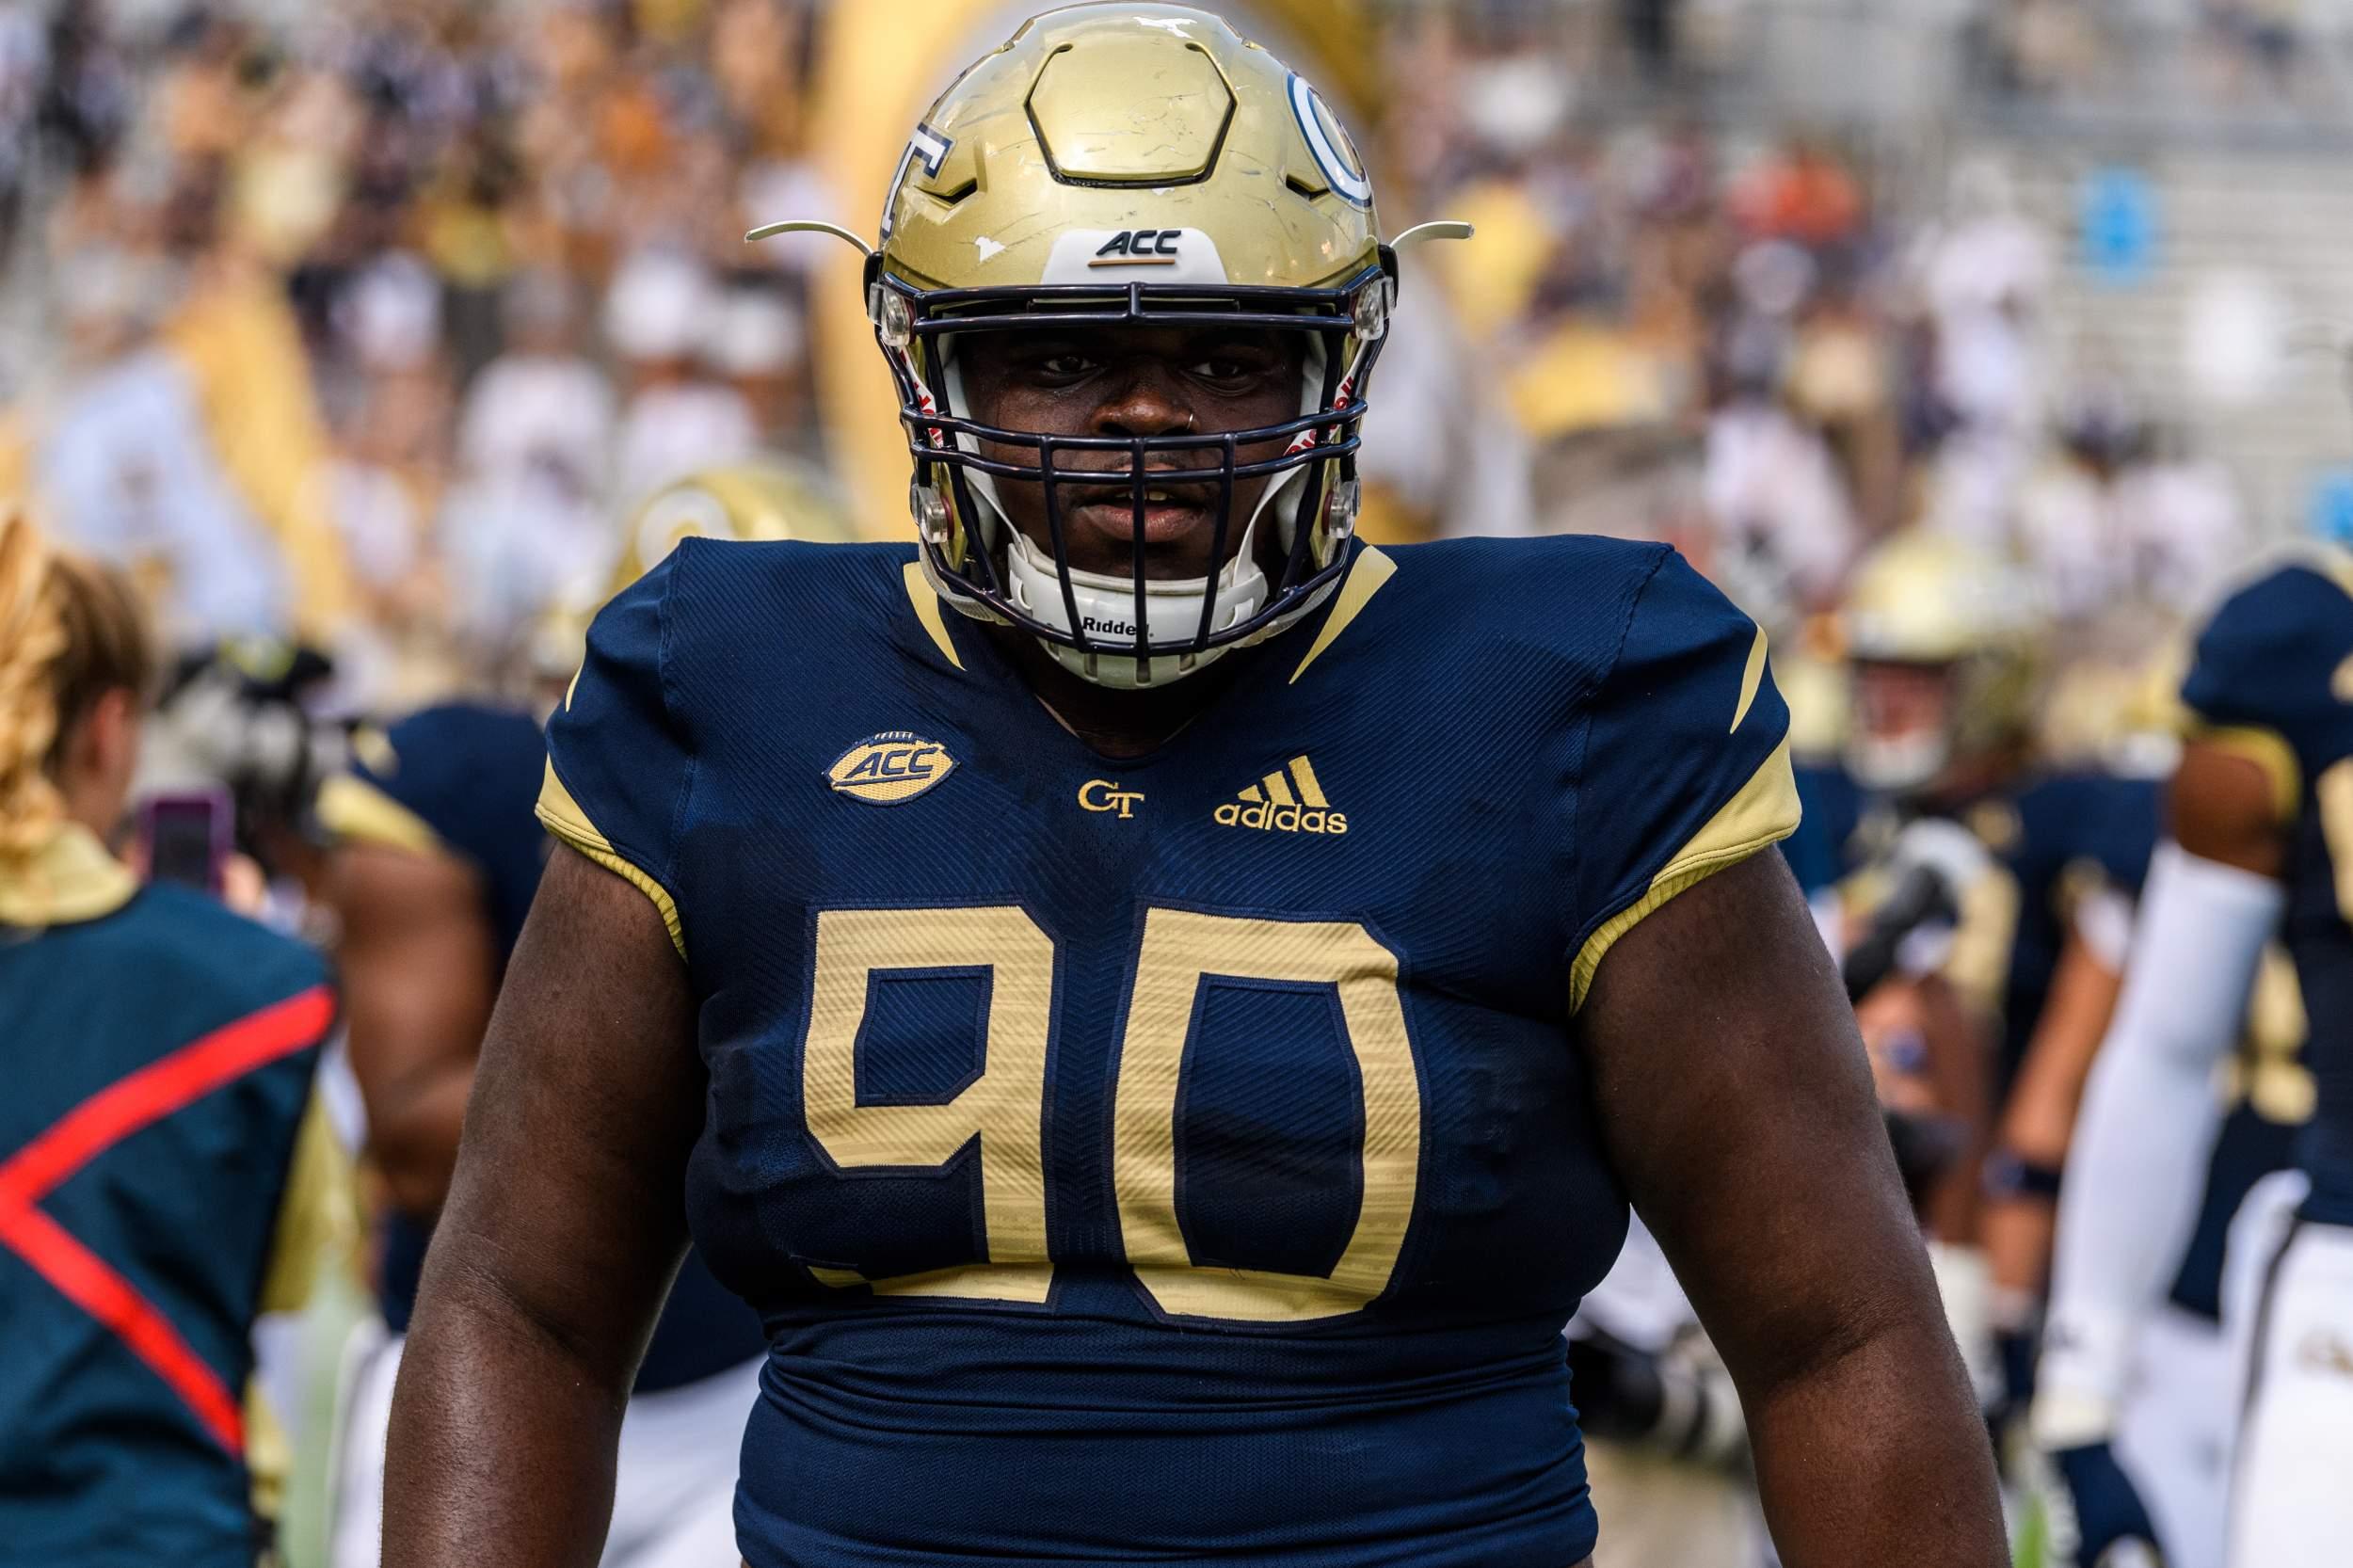 Everyday Champions: Big B Lives On